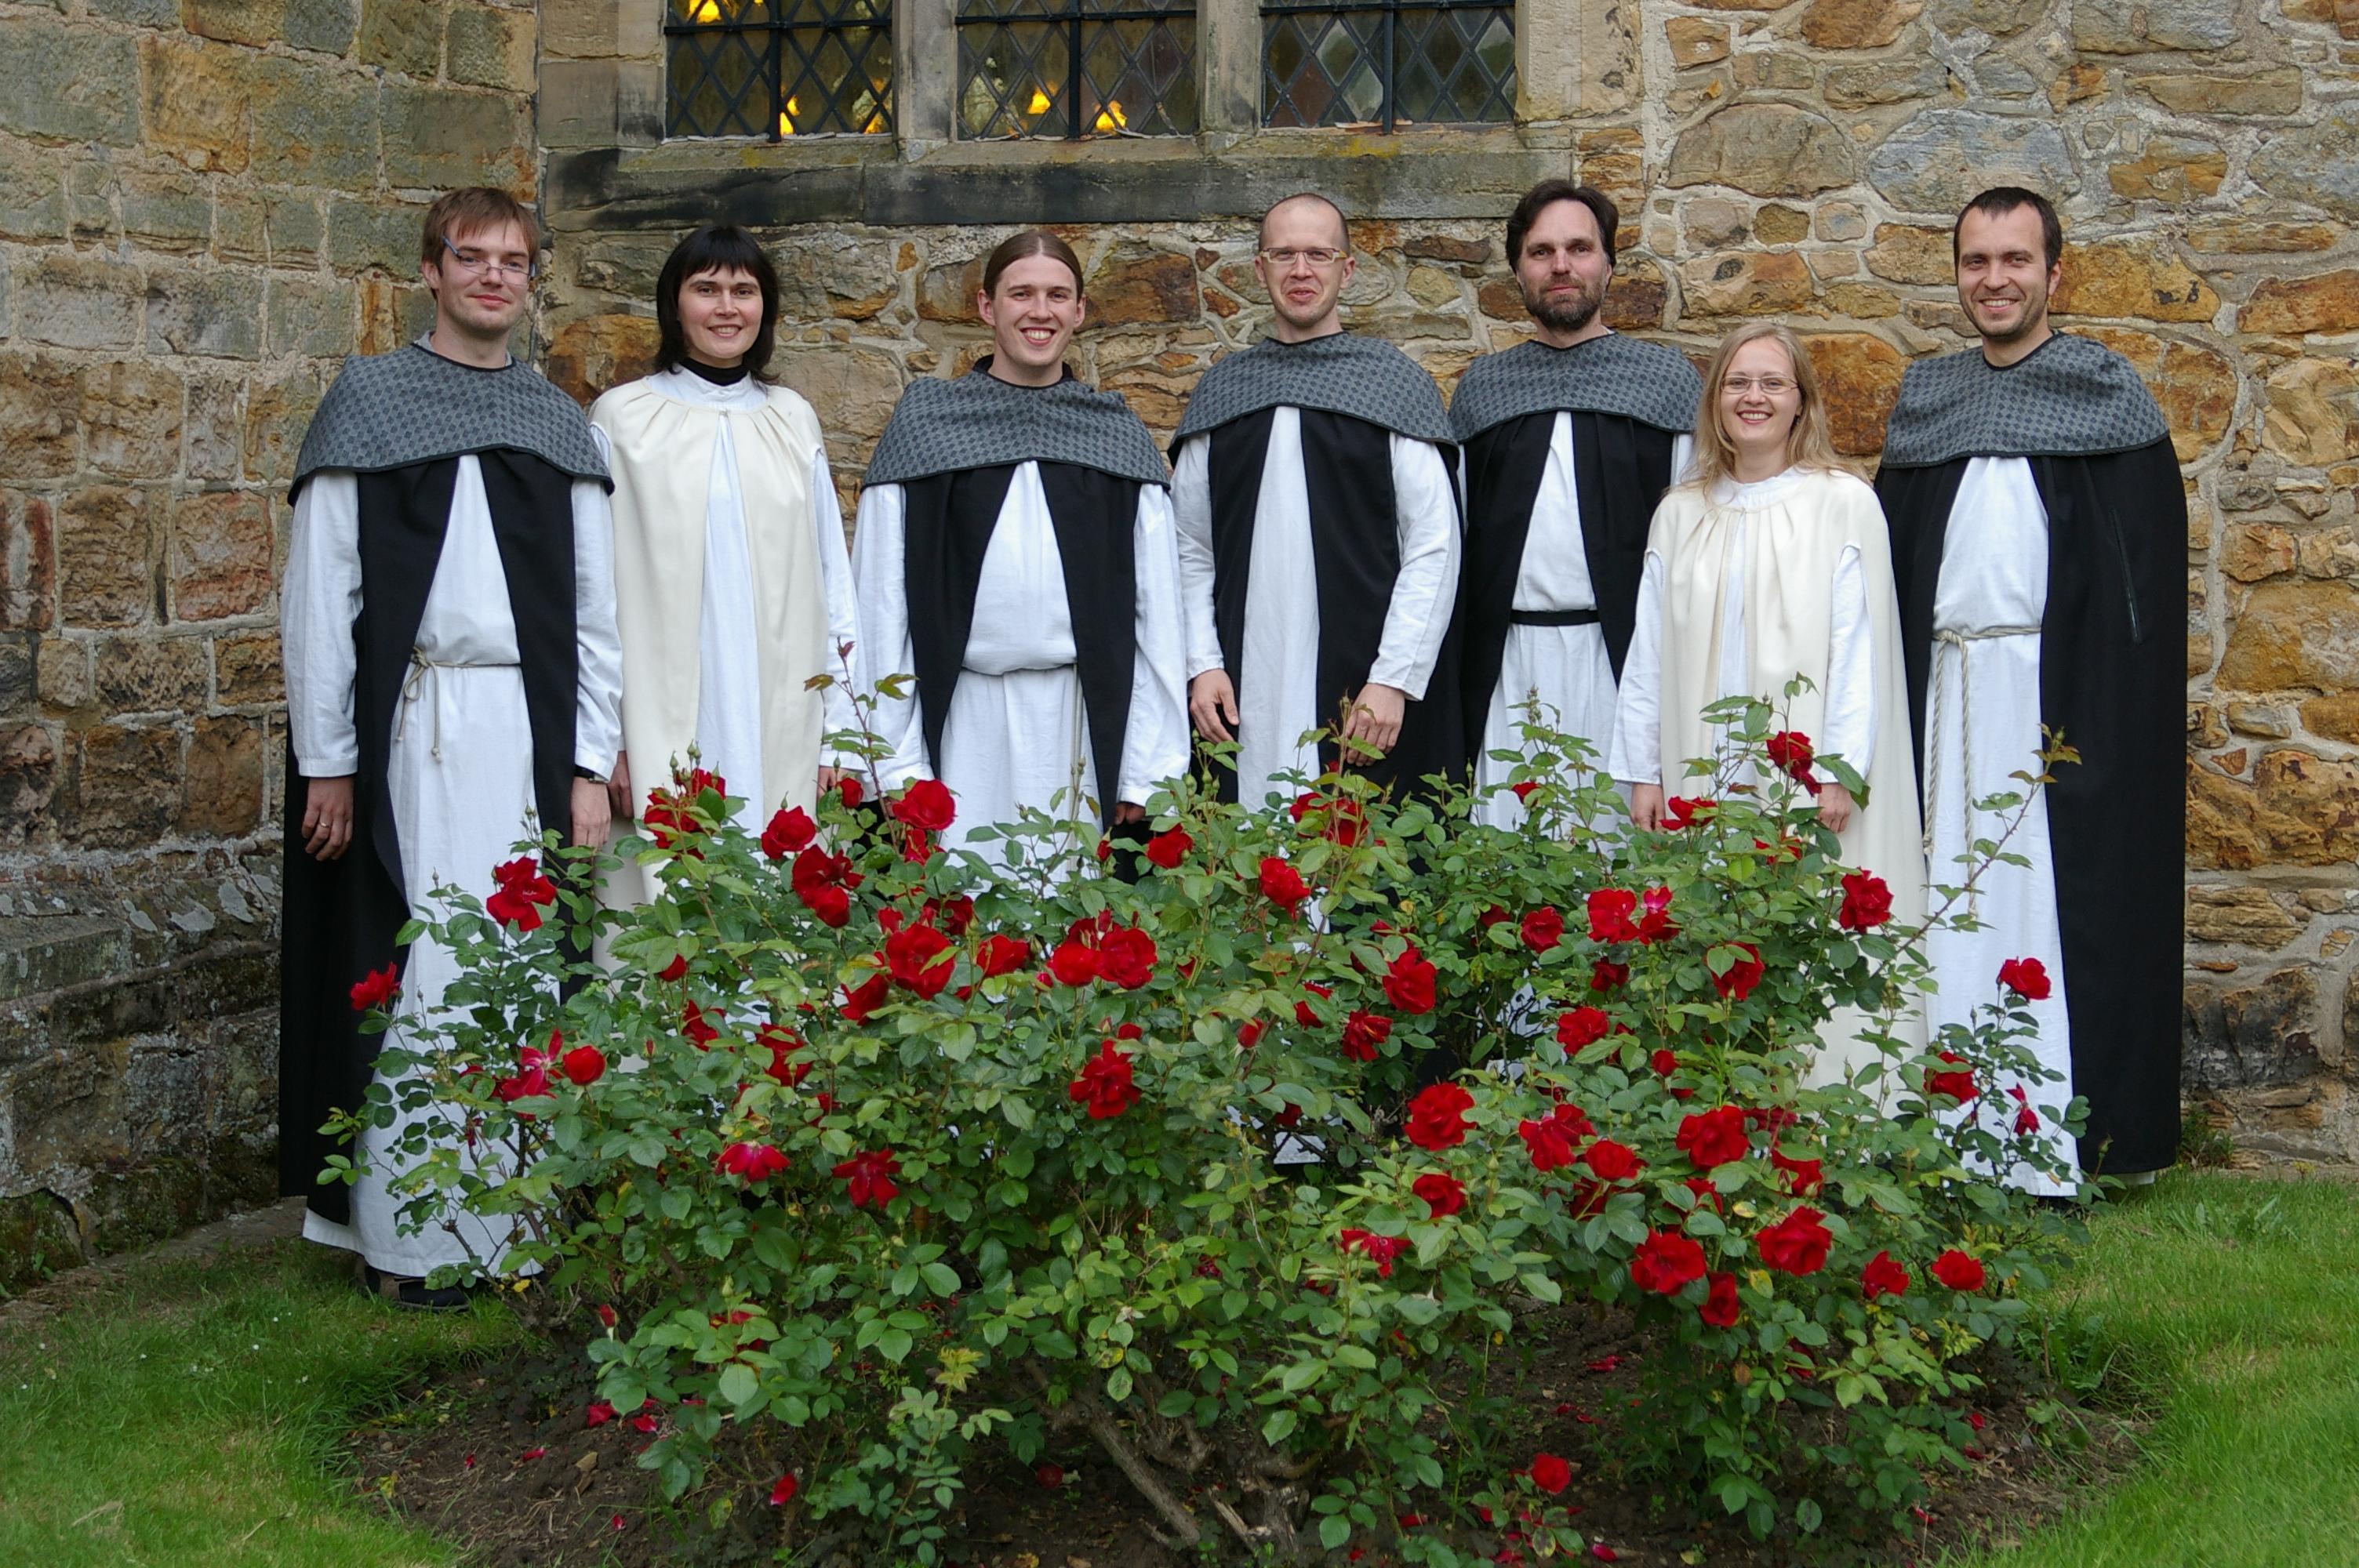 Heinavanker Estonian Vocal Ensemble